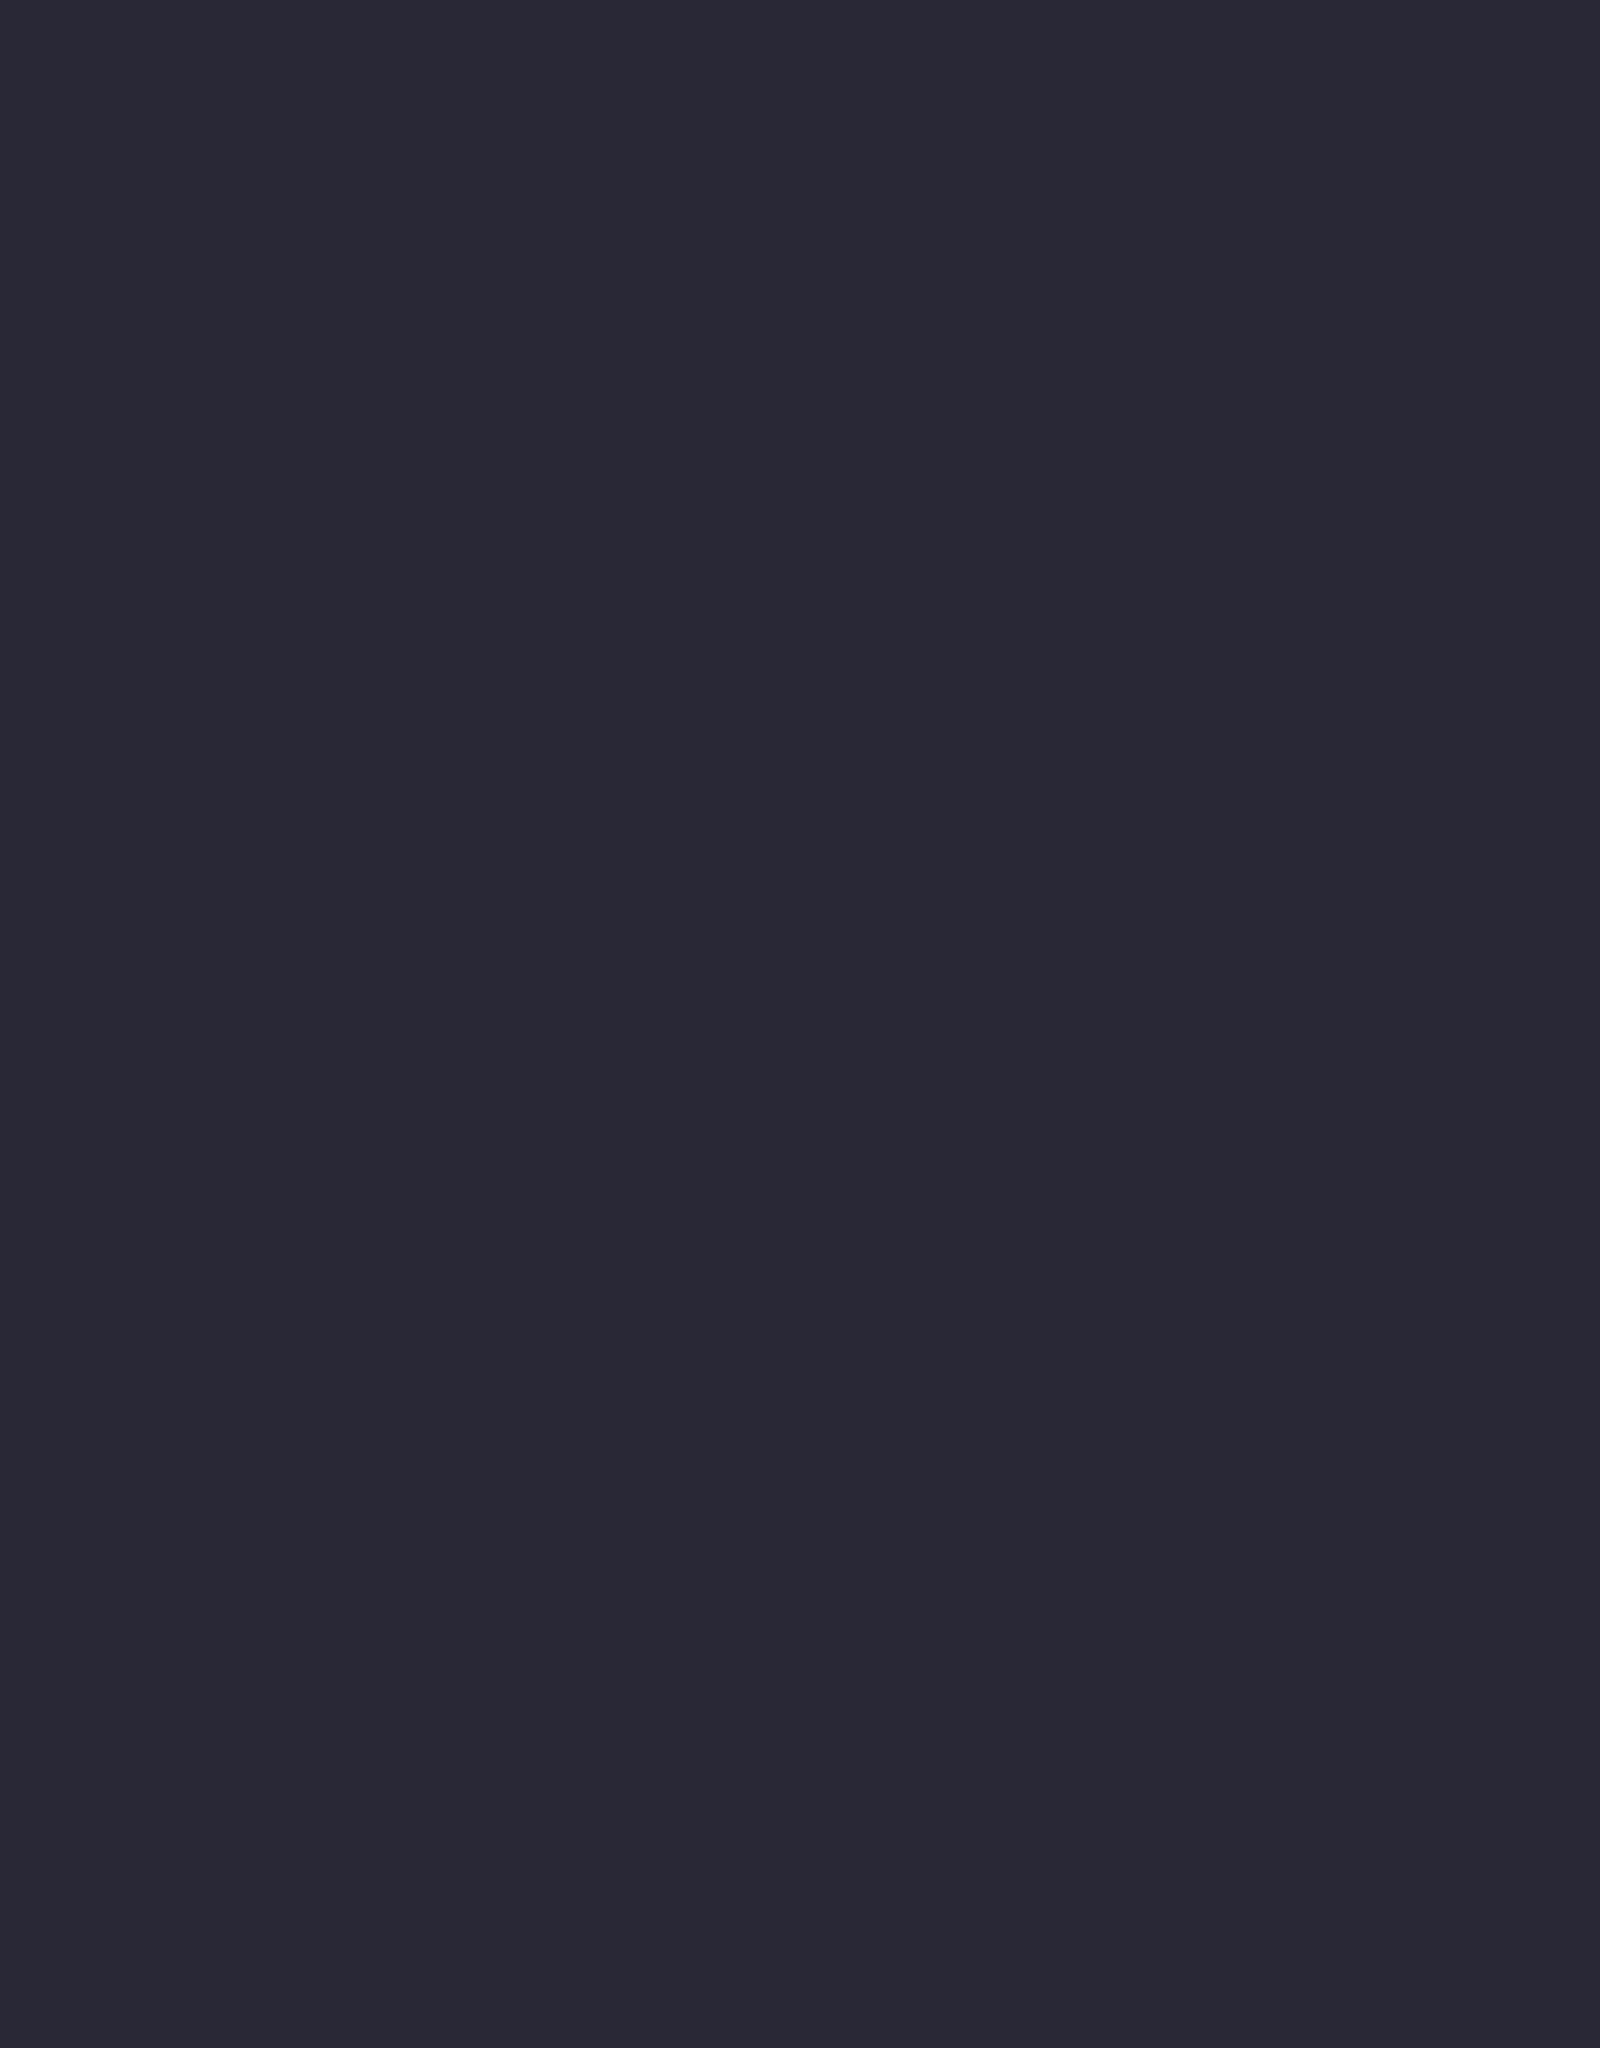 Trapsuutjies Nachtblauw